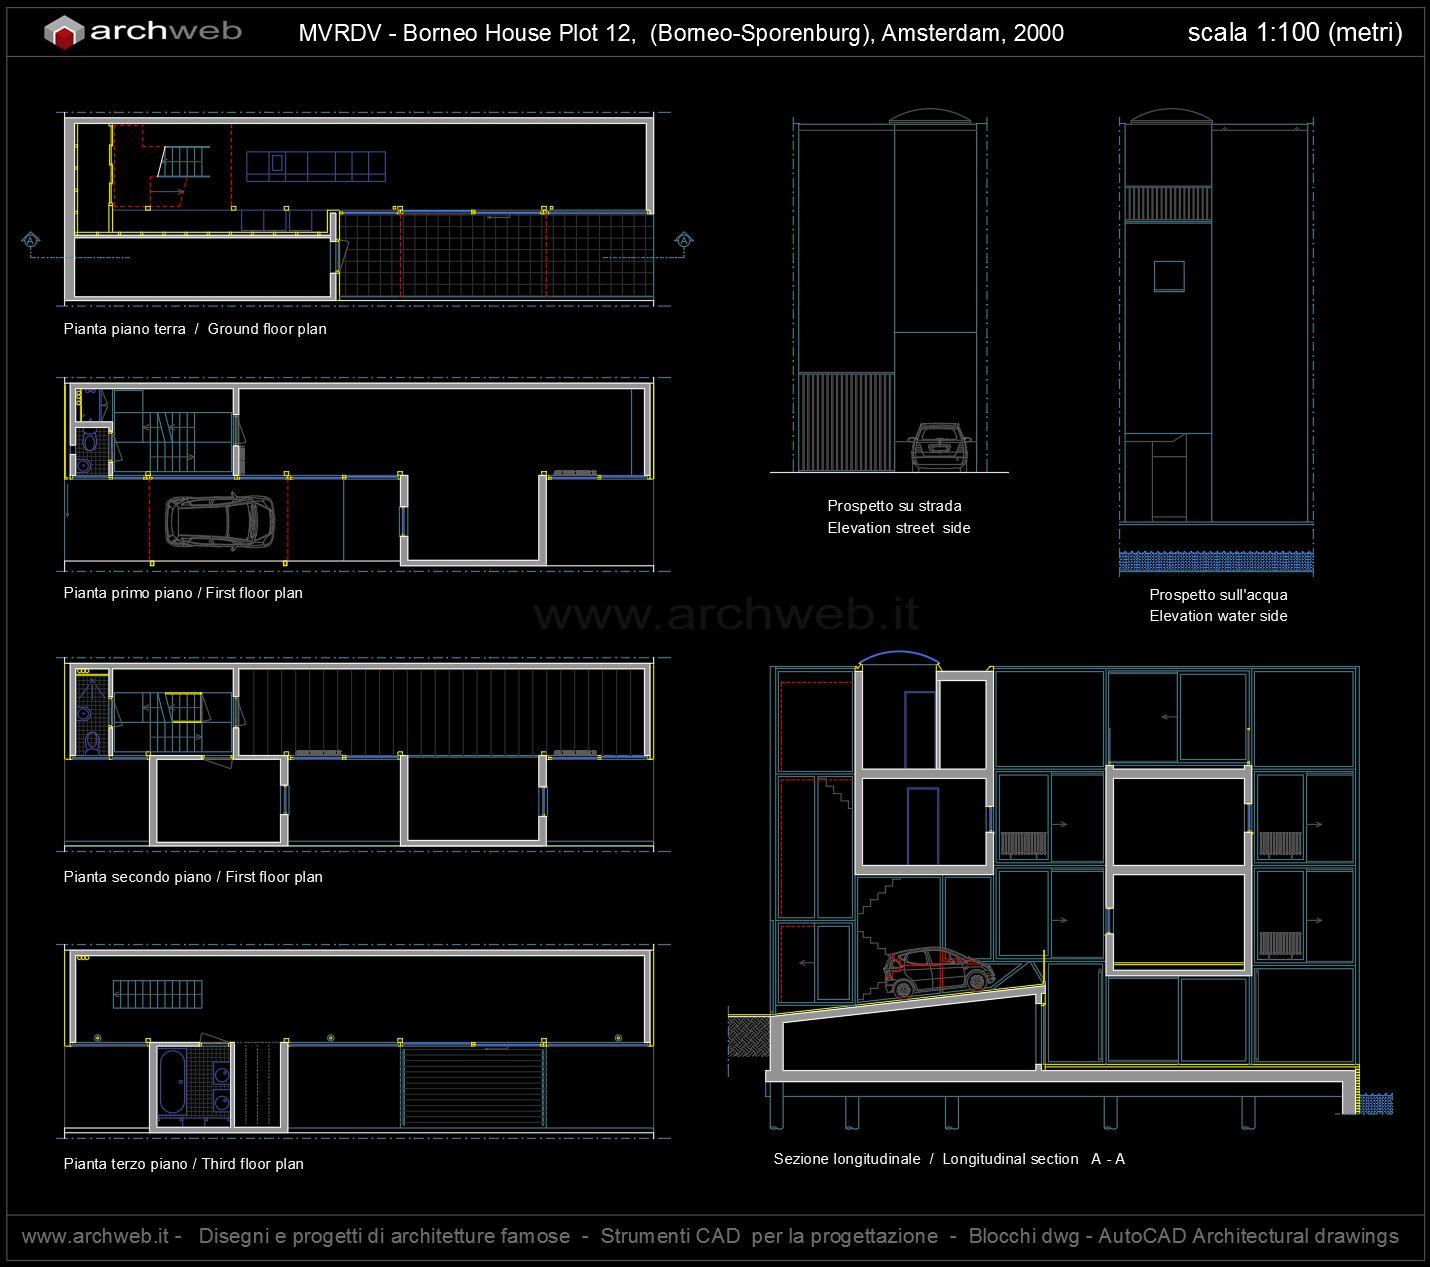 Borneo House Plot 12 Sporenburg Amsterdam 1999 Mvrdv Technical Structural Diagram Of Double Mansard Roof And Glazing Infill Archweb